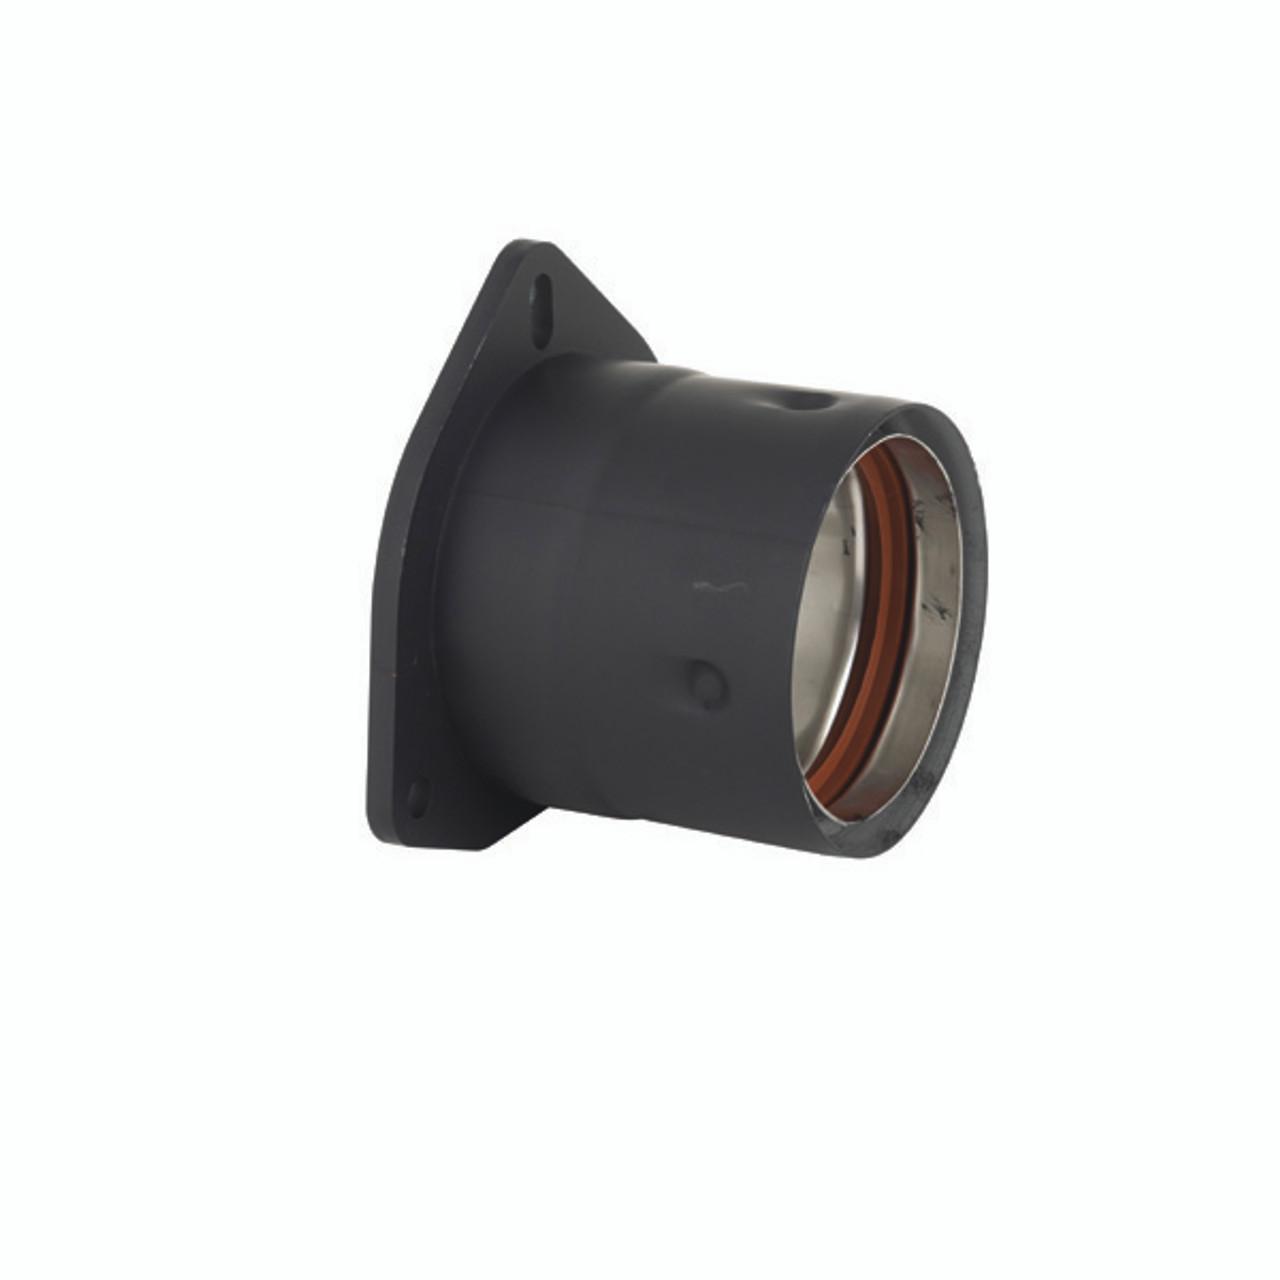 Ventis Pellet Vent Harman Stove Collar Adapter - Harm2